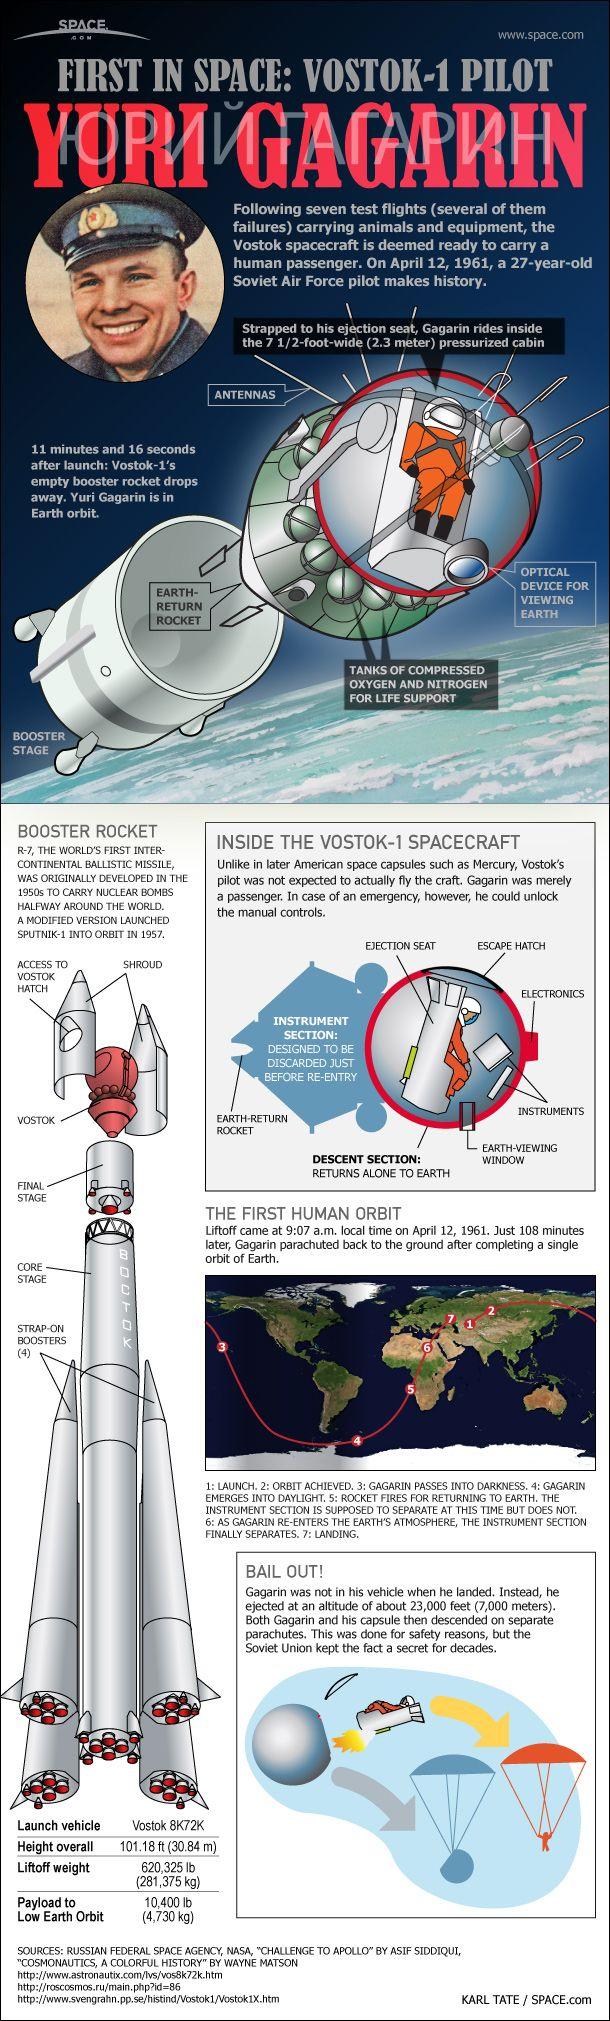 Yuri Gagarin: First Man in Space #Infographic